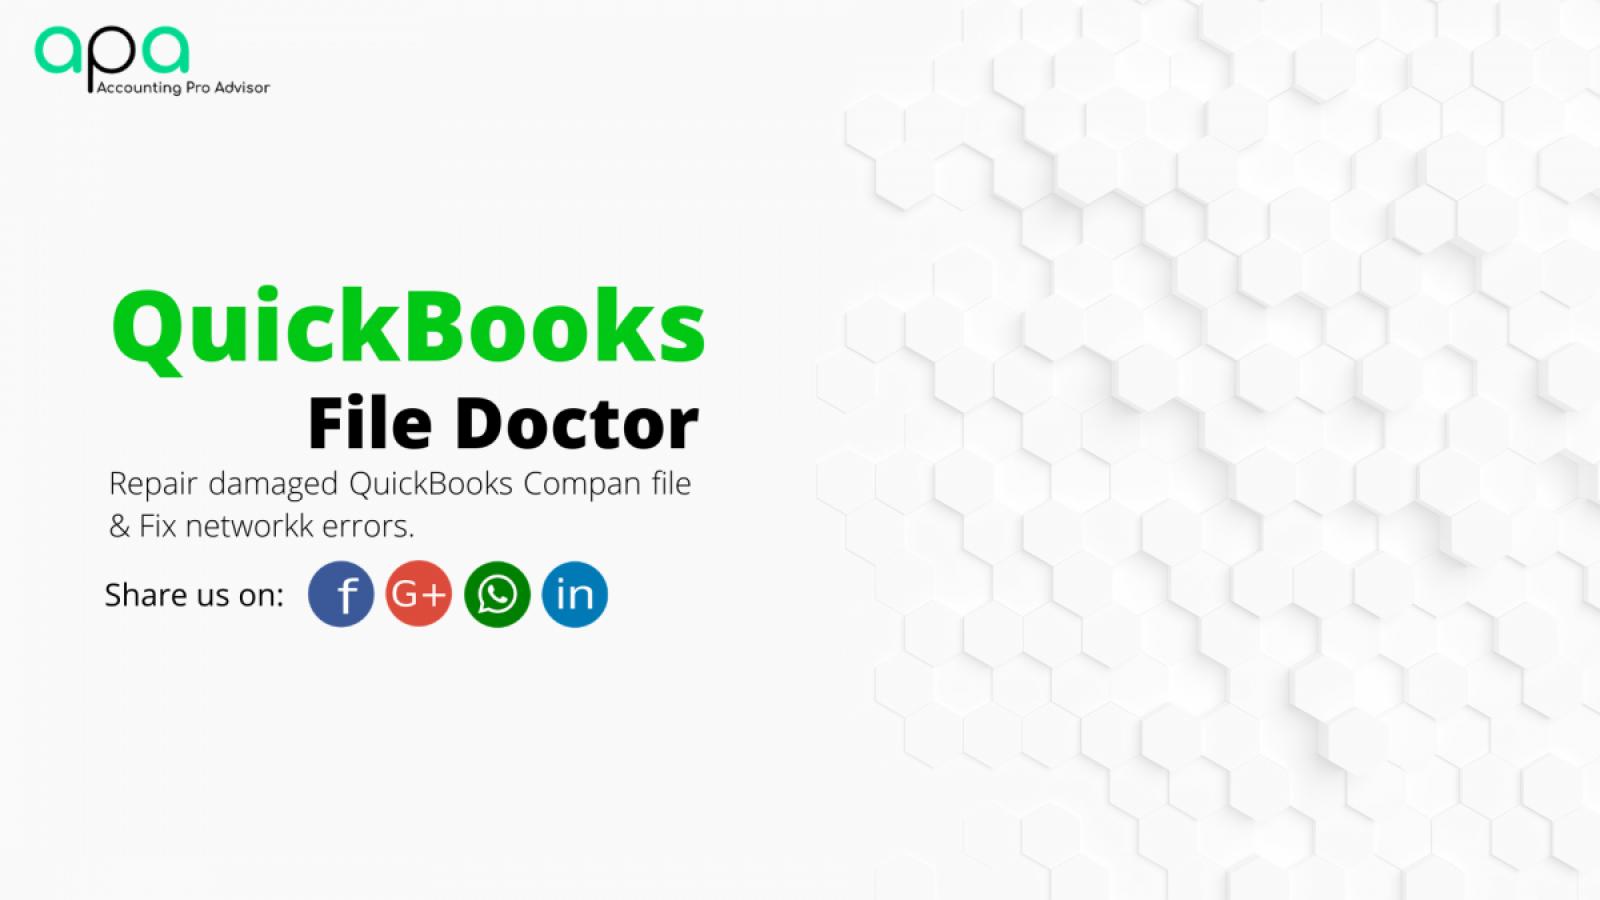 QuickBooks File Doctor (2)